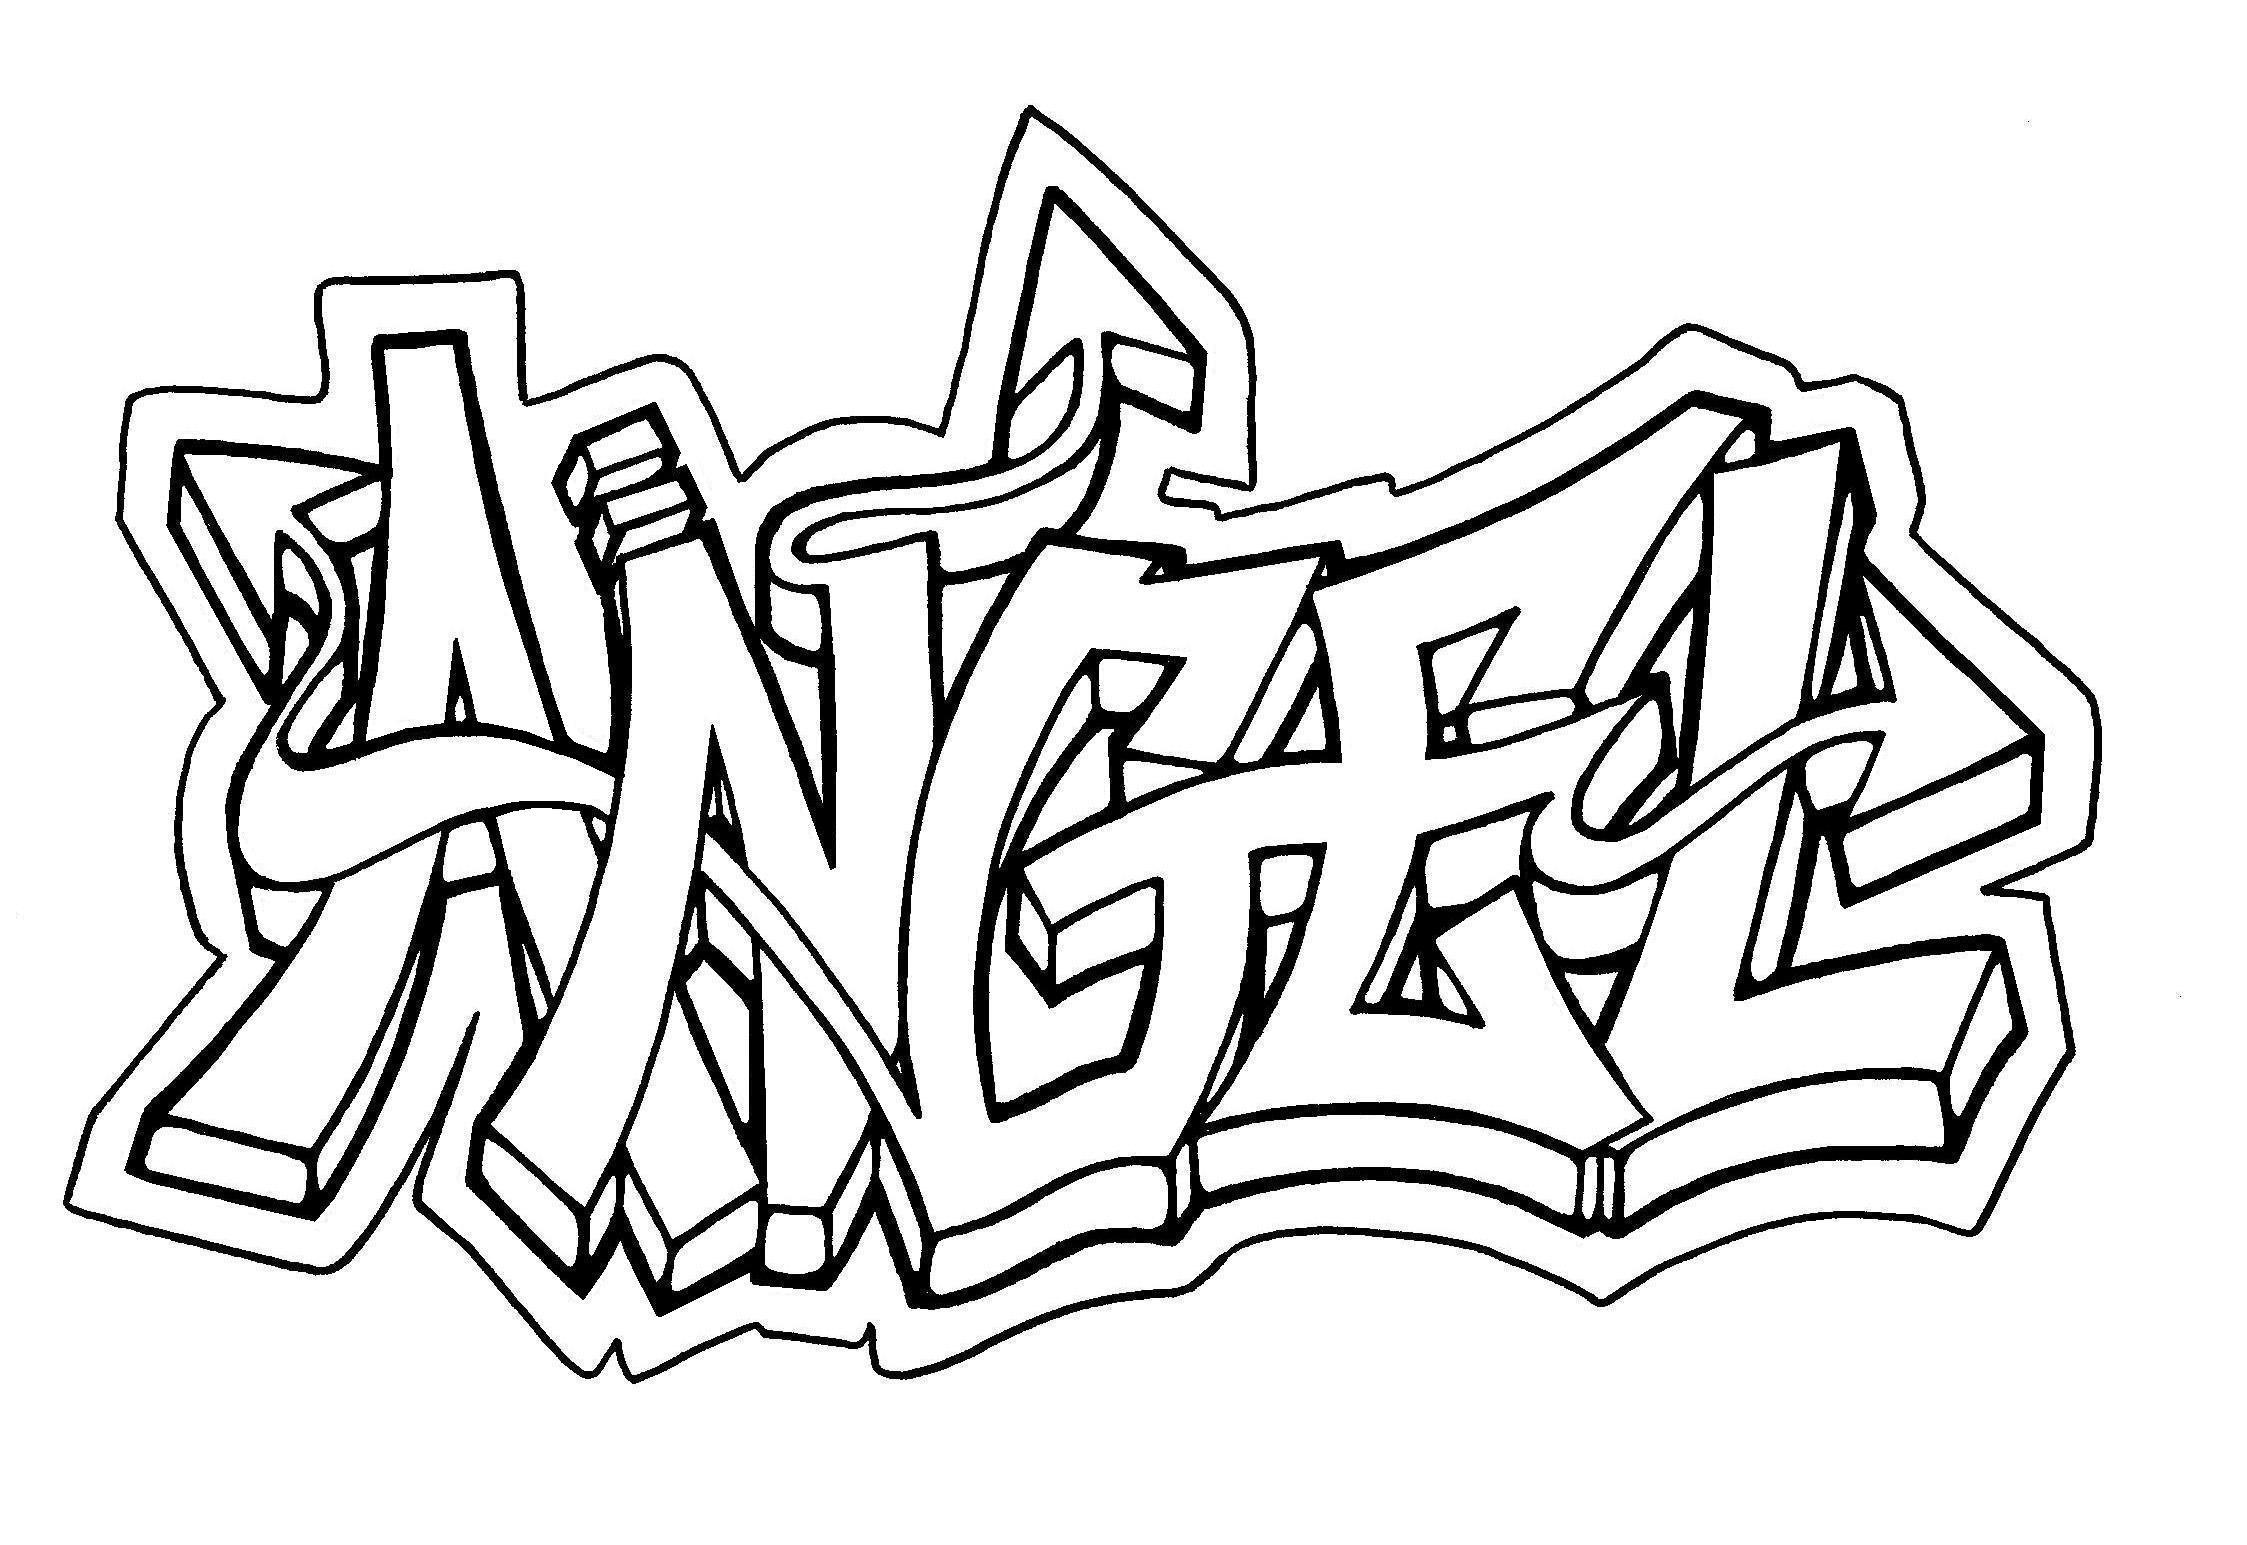 2247x1545 Cool Graffiti Drawings Letters Community Wall Project